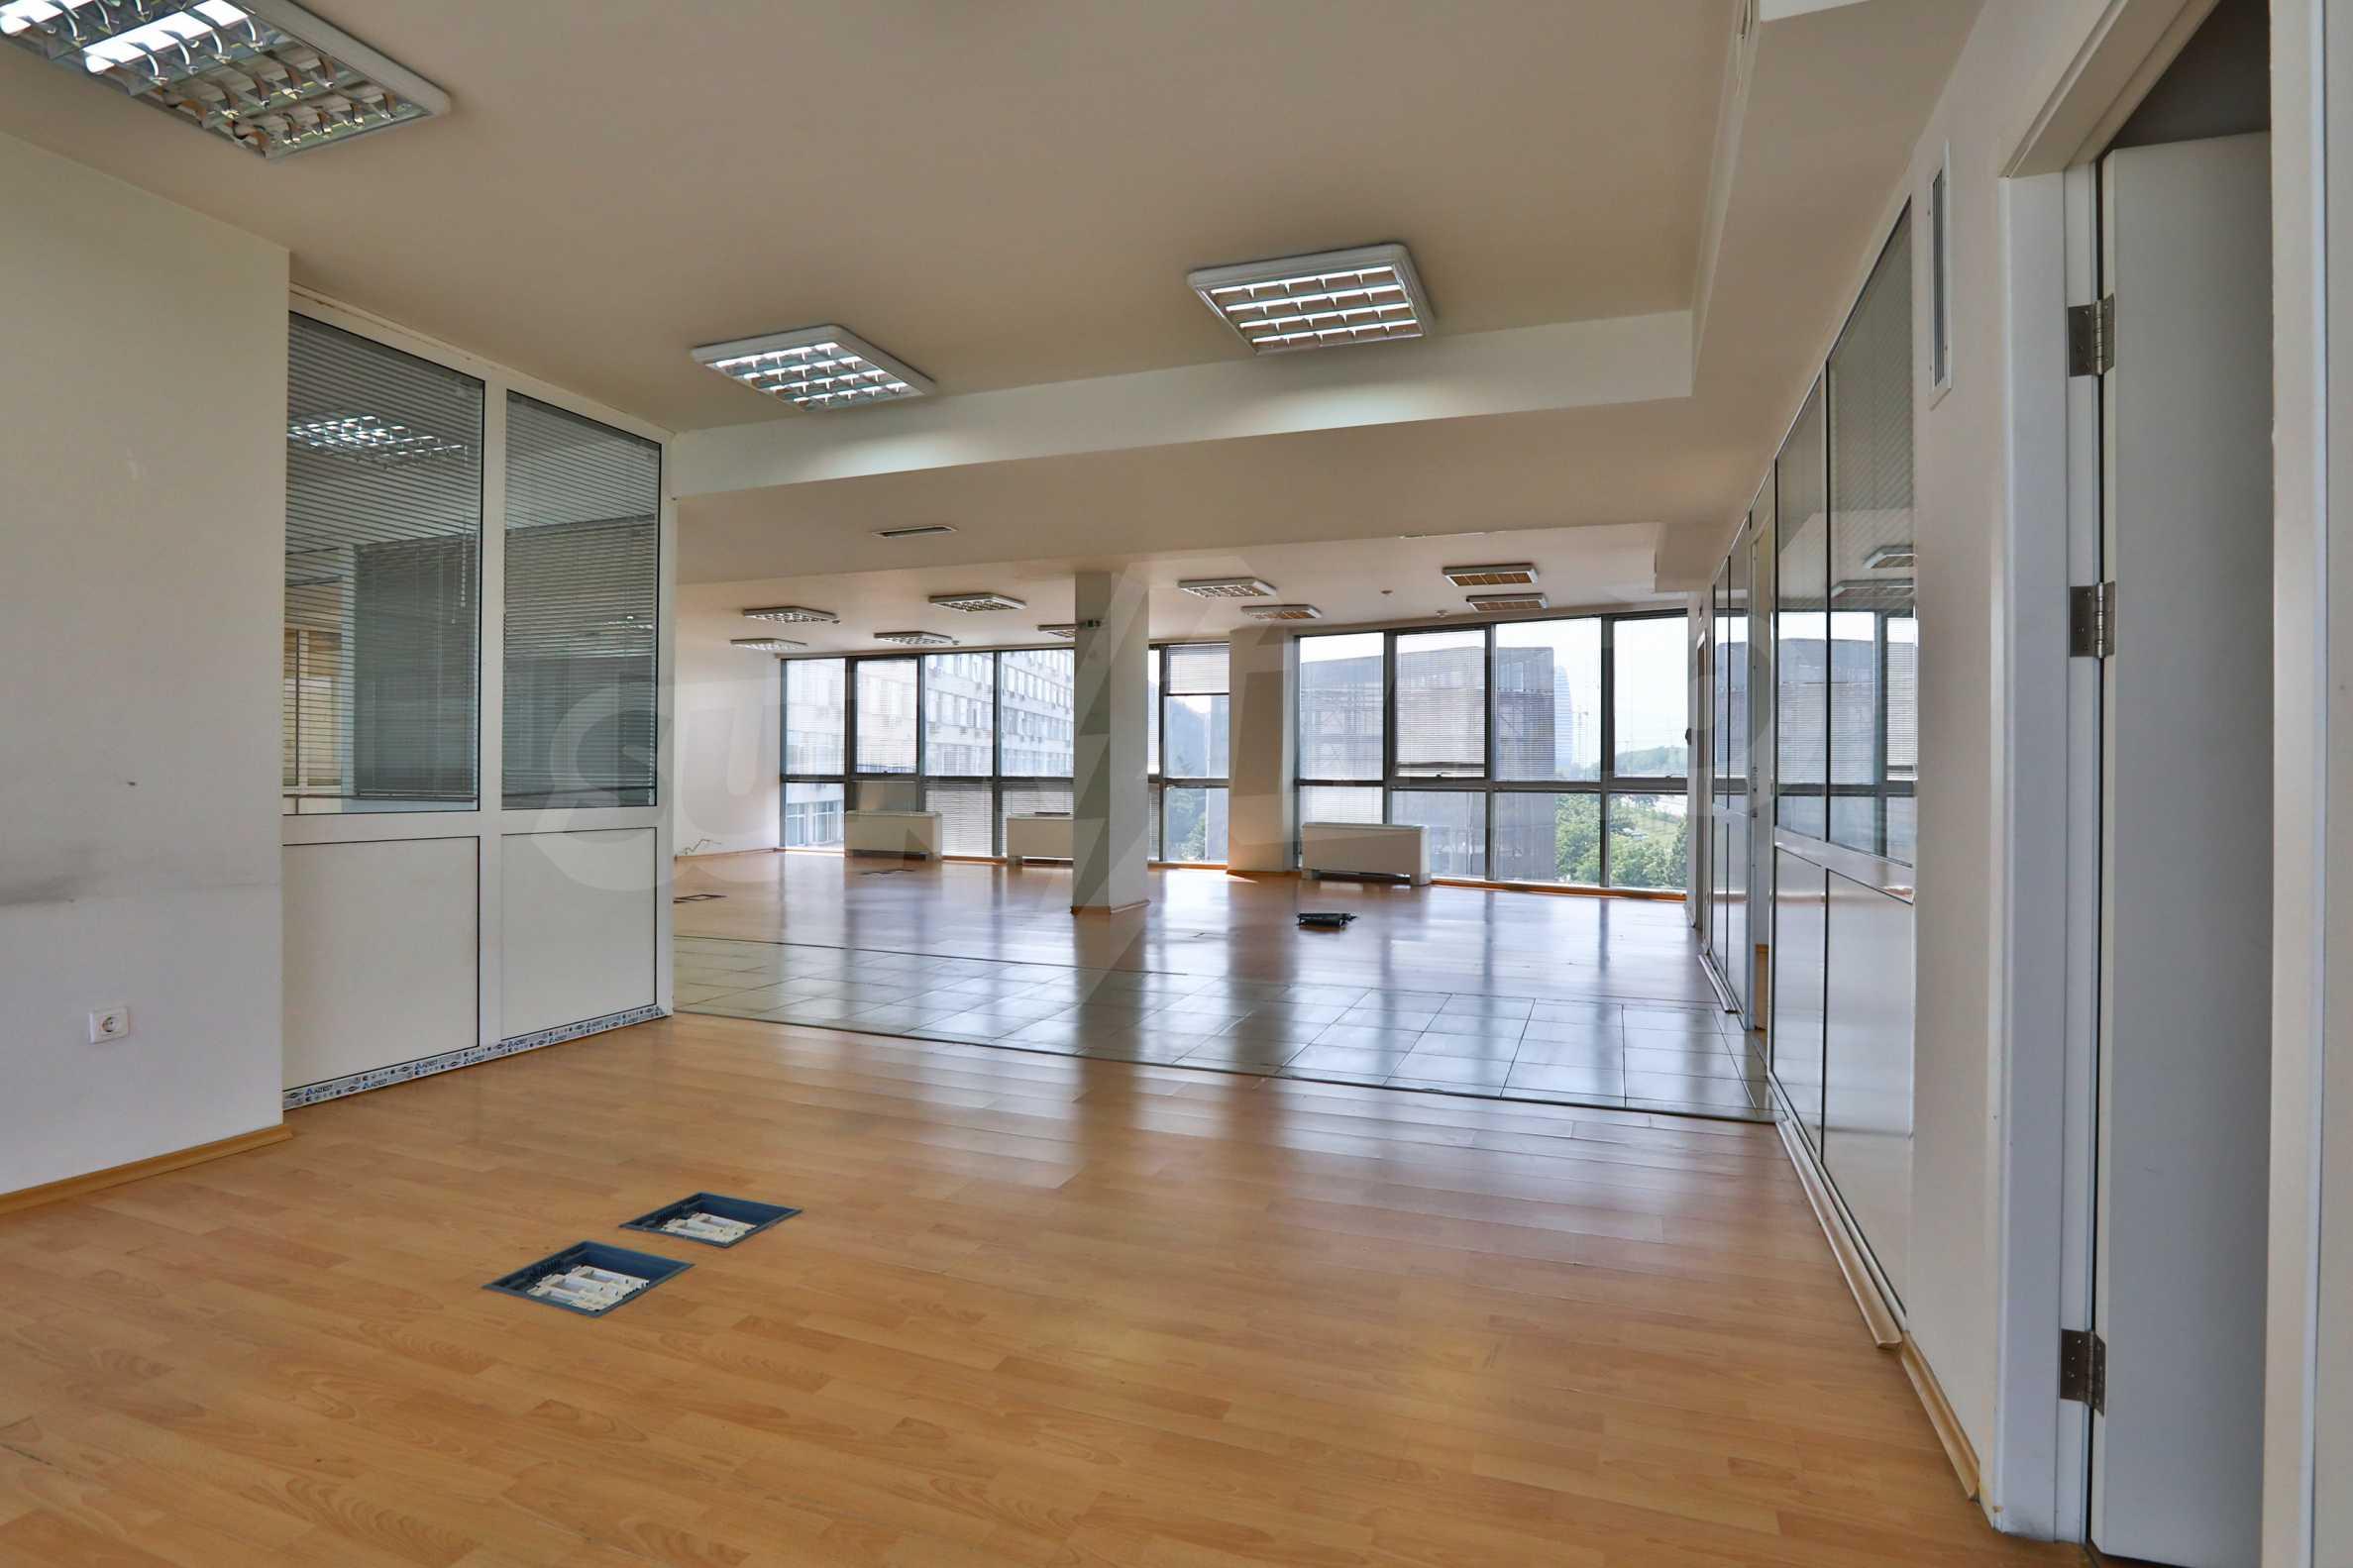 Офис в бизнес сграда висок клас на бул. Цариградско шосе 25